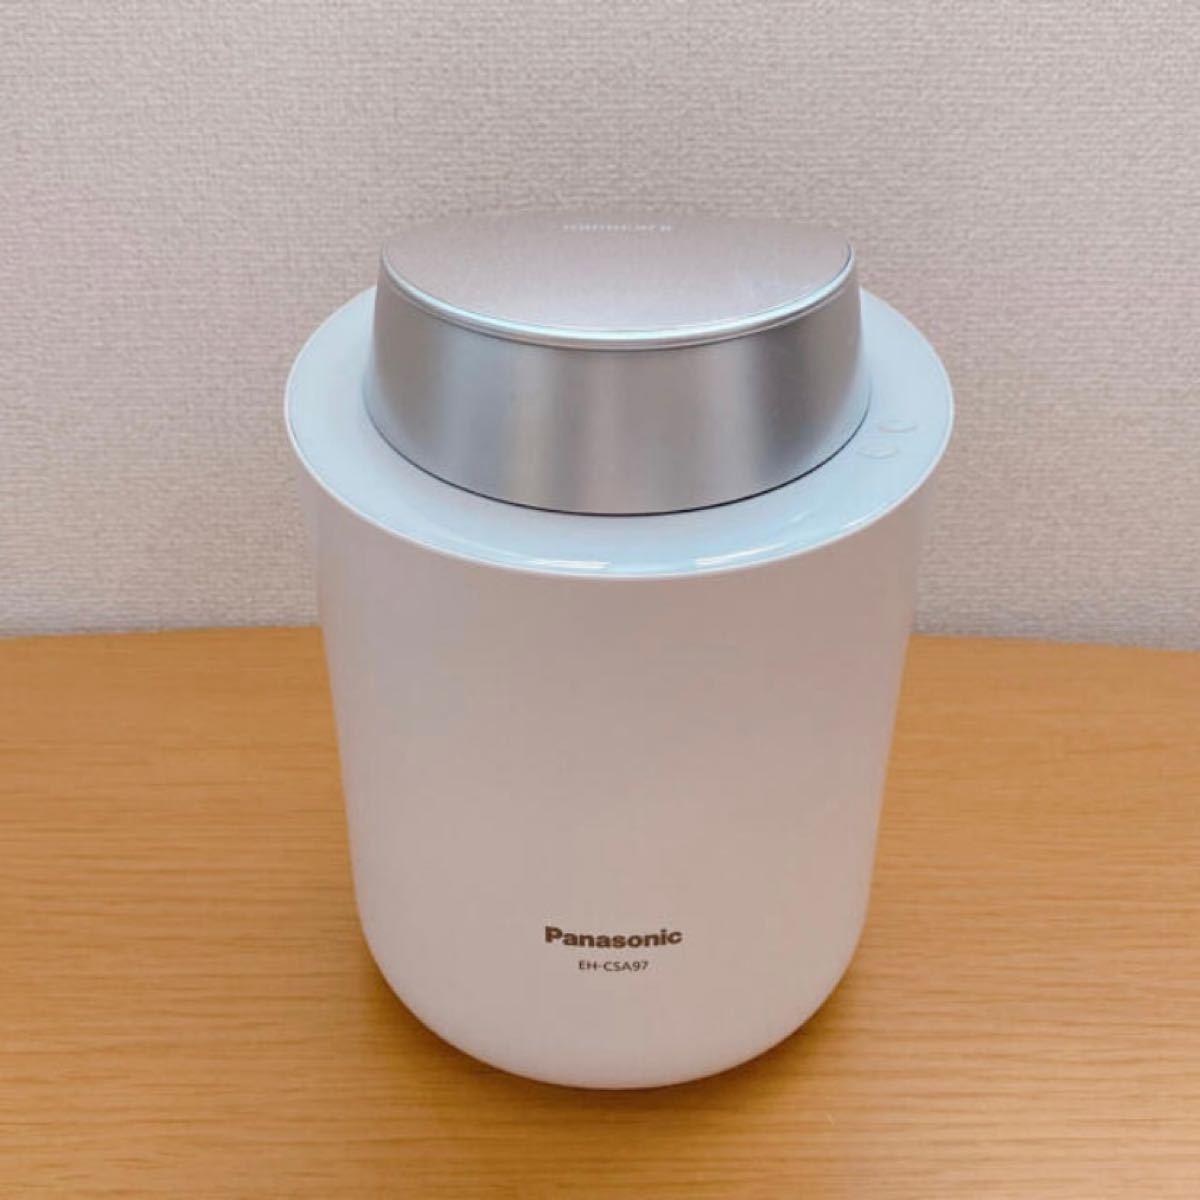 【Panasonic】スチーマーナノケア EH-CSA97